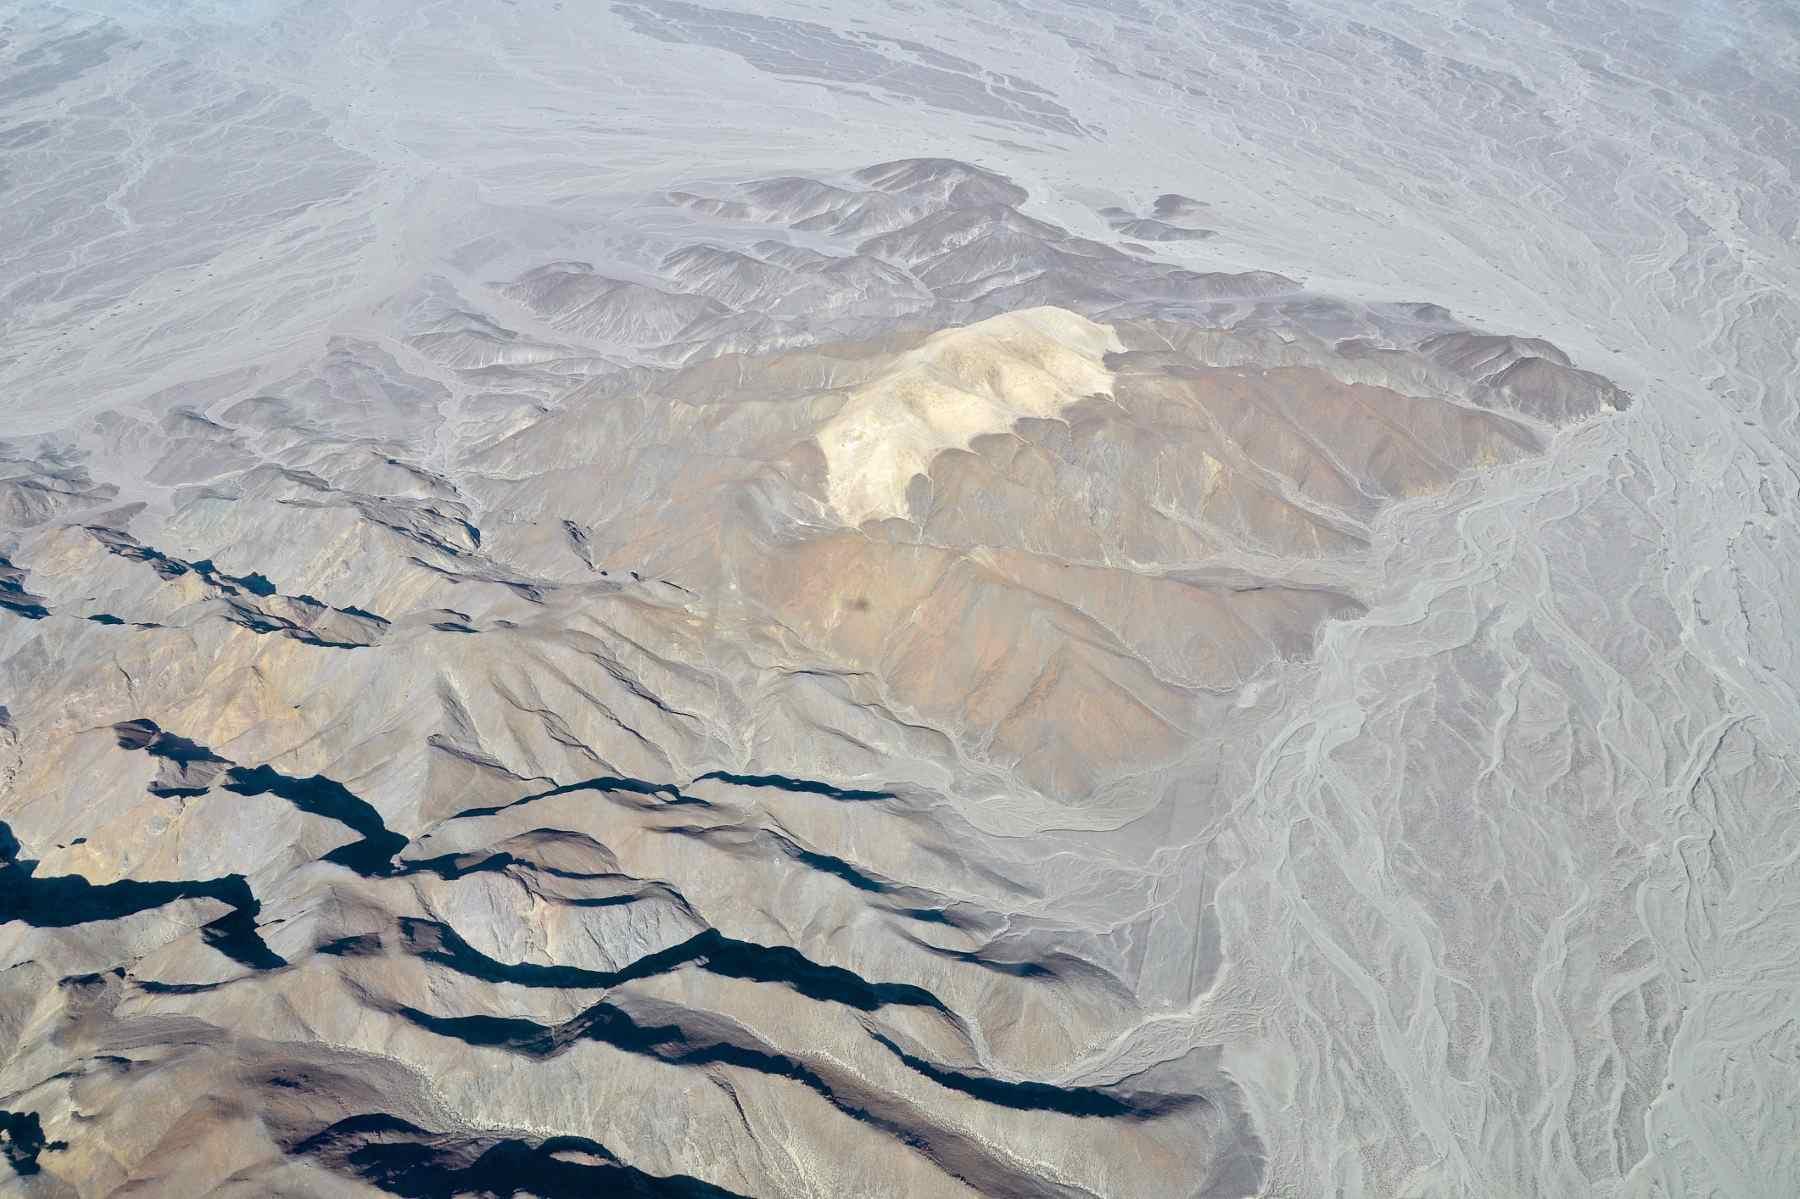 Aerial photo of Cerro Blanco in Peru